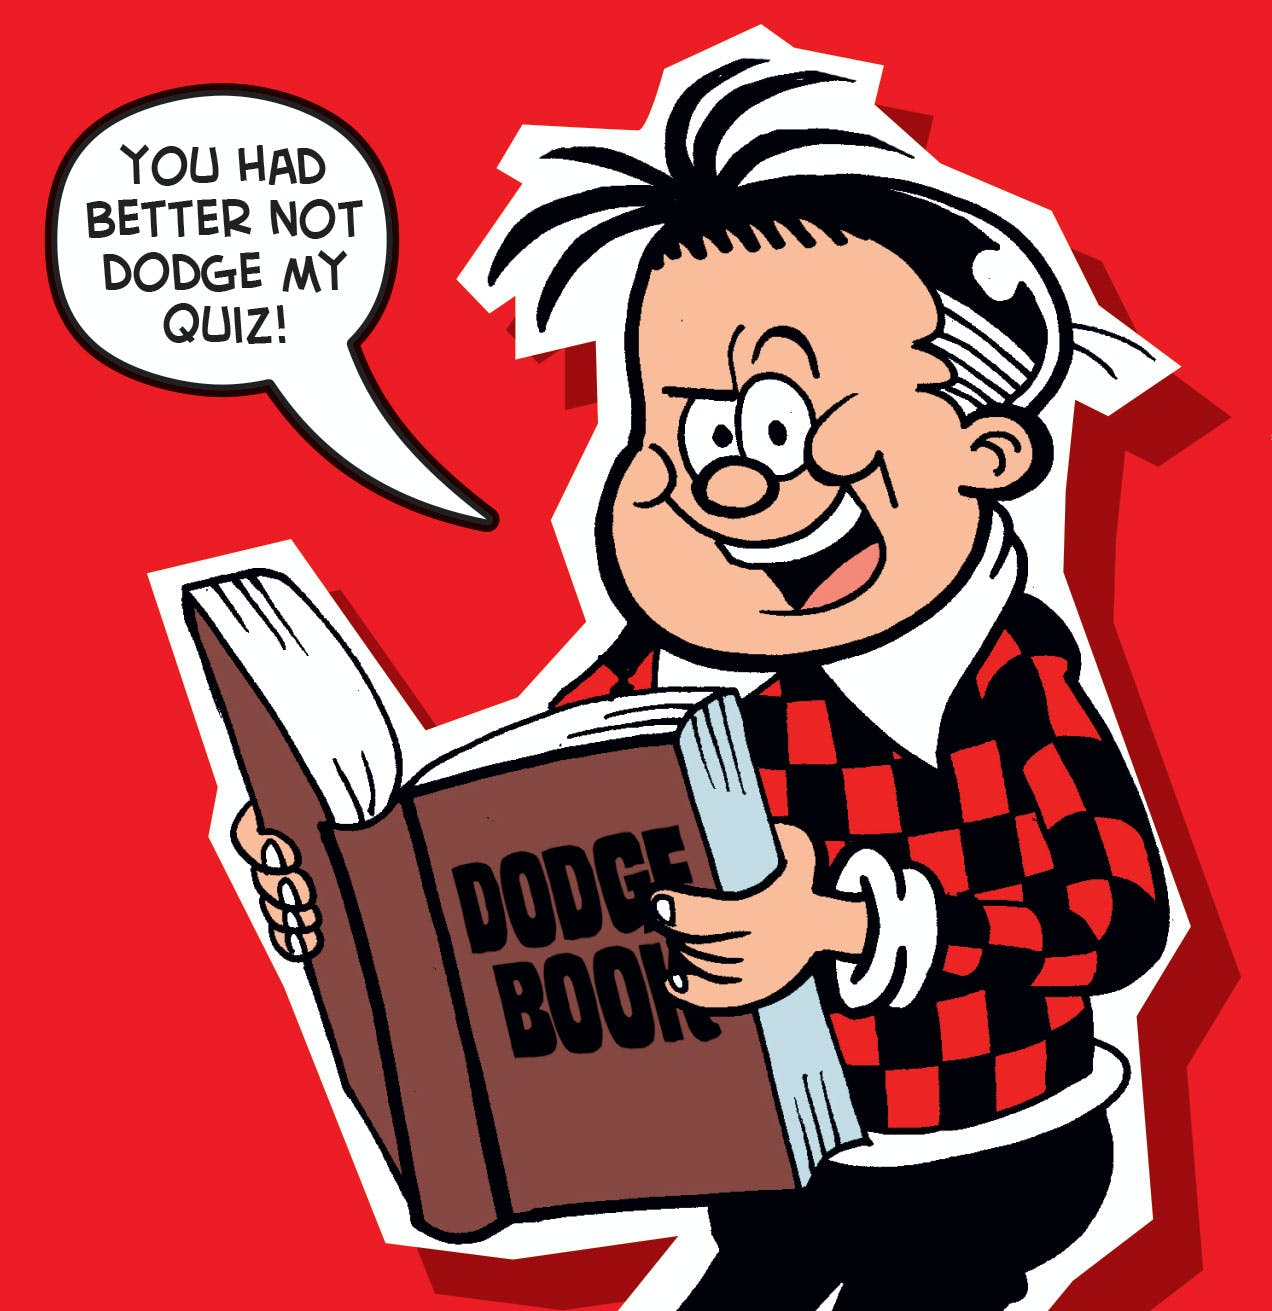 Don't dodge Roger's quiz!